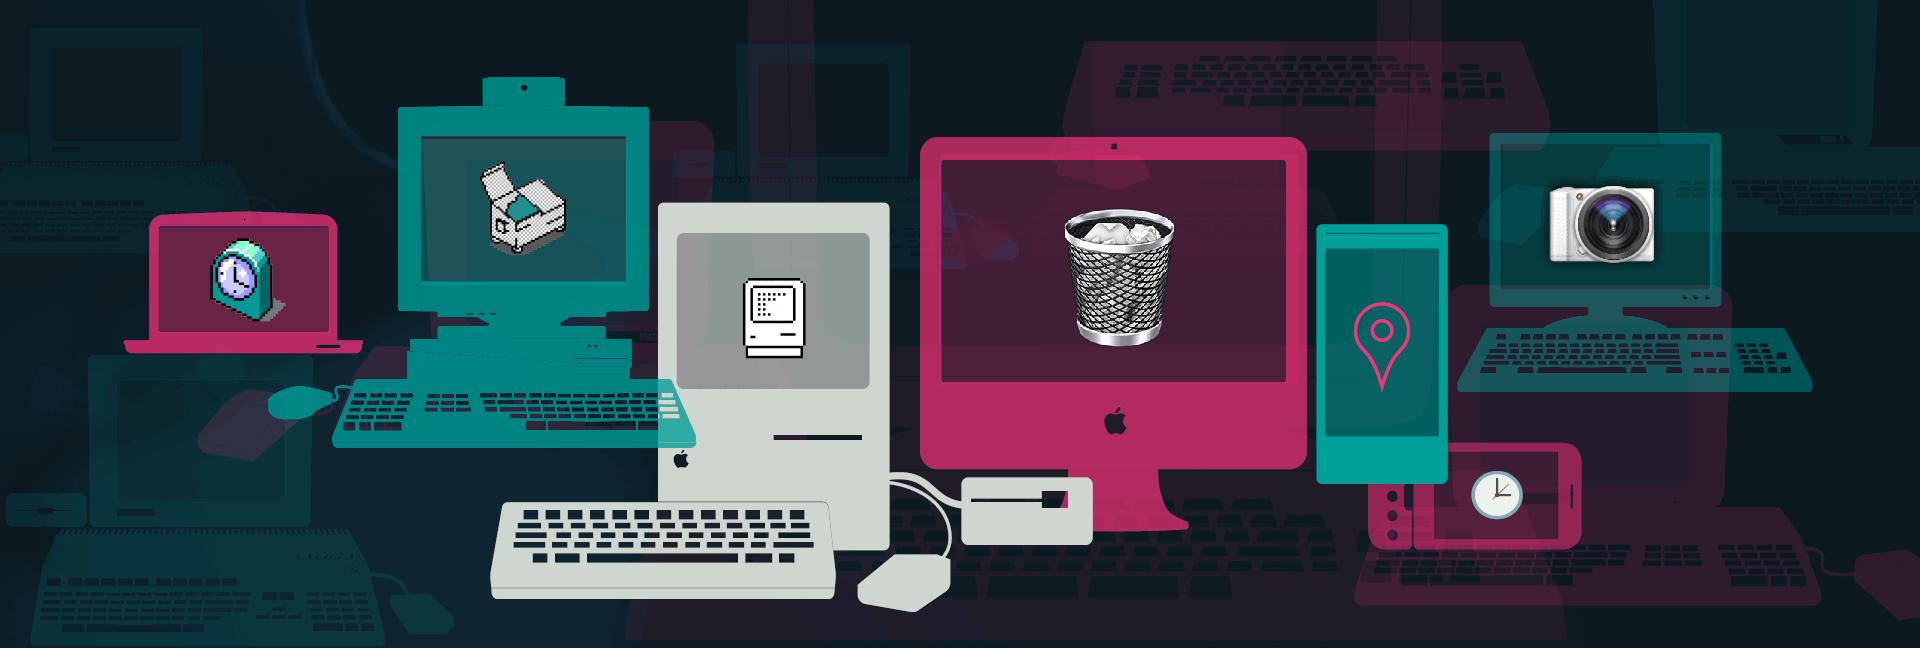 Visual history of computer icons